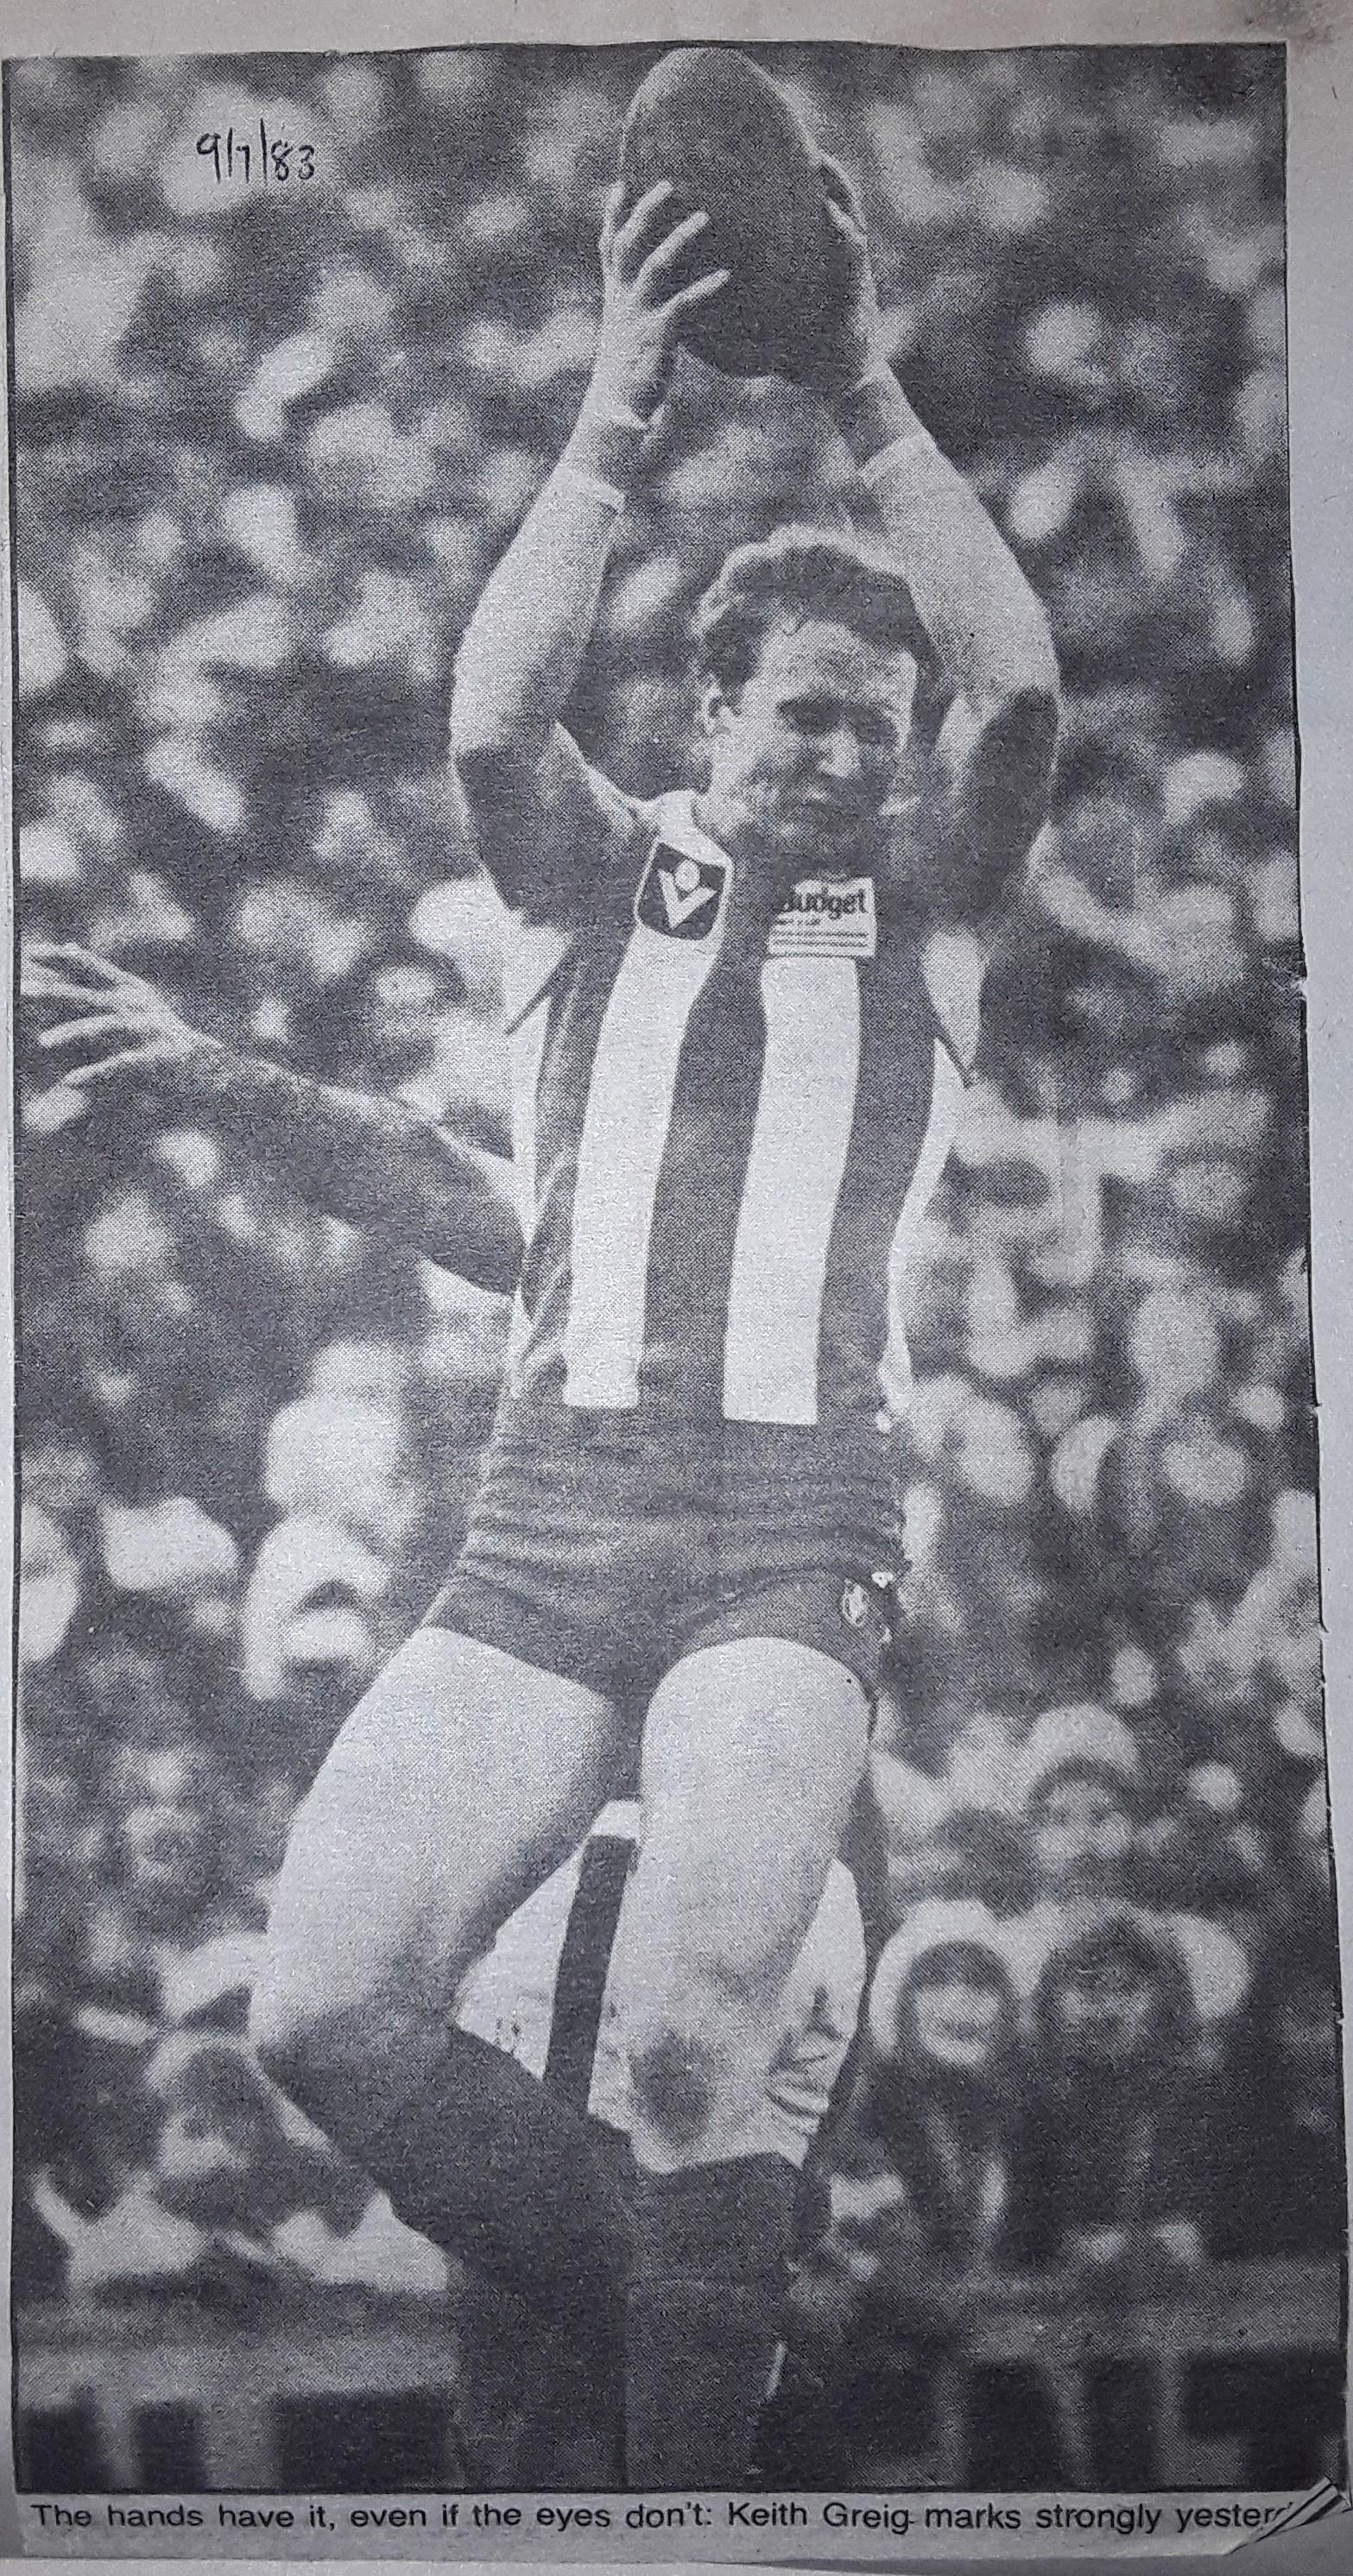 1983 Greig.jpg